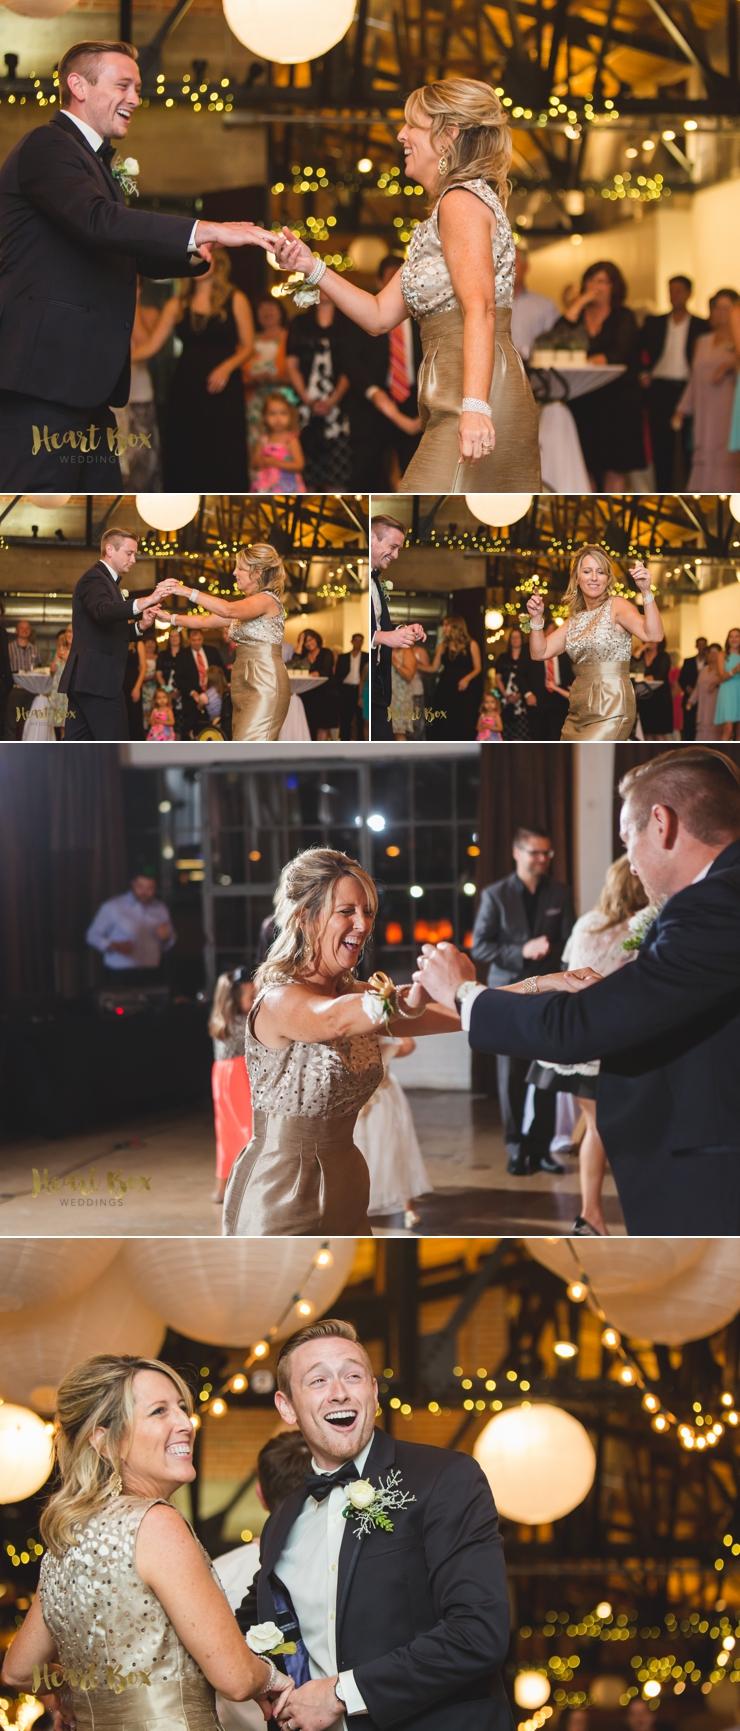 Mabry Wedding 22.jpg